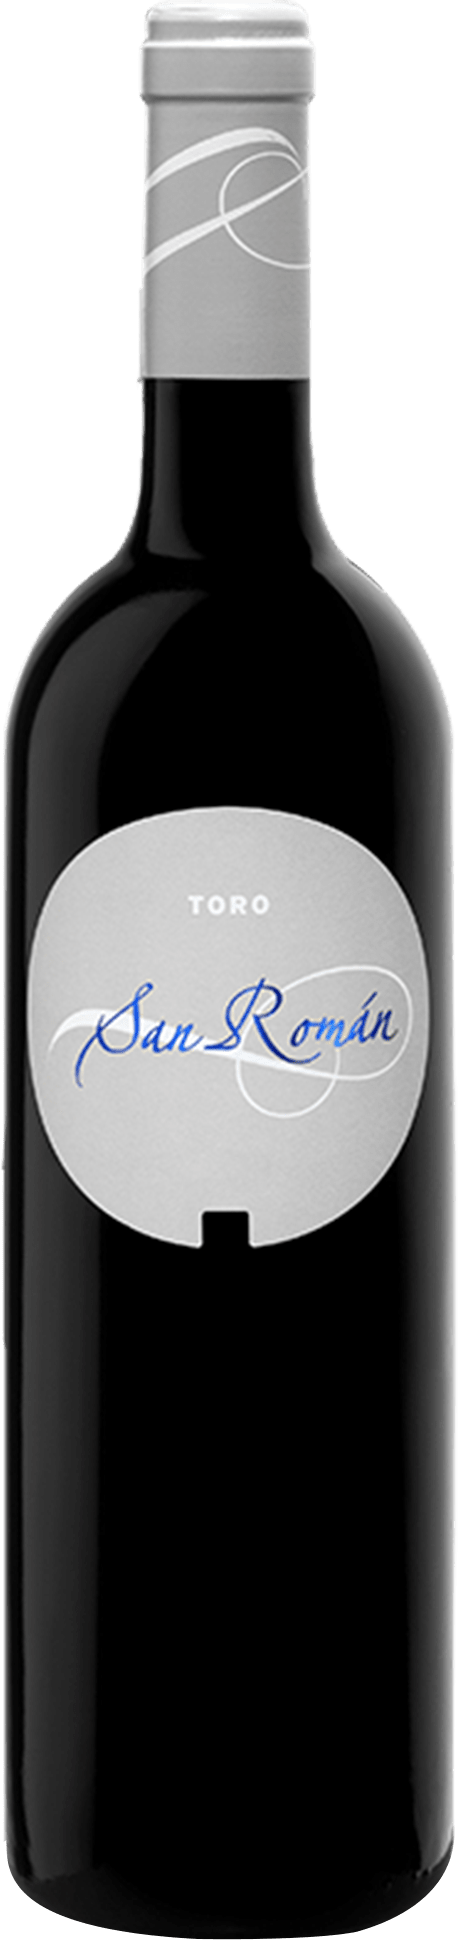 2016 San Roman Toro